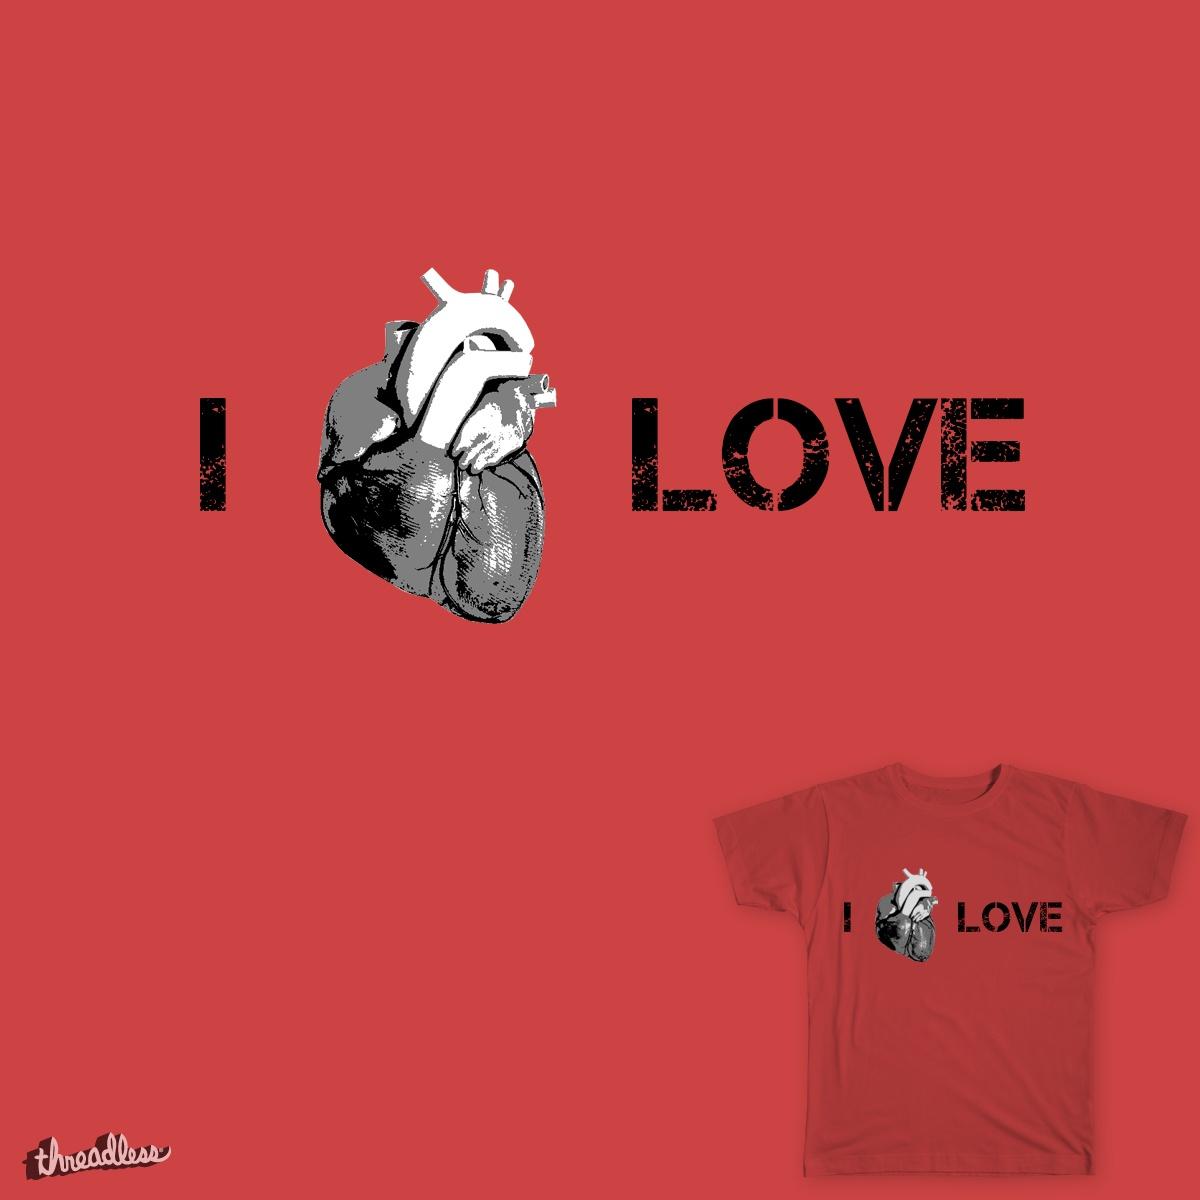 I heart love by oneofthesedays on Threadless